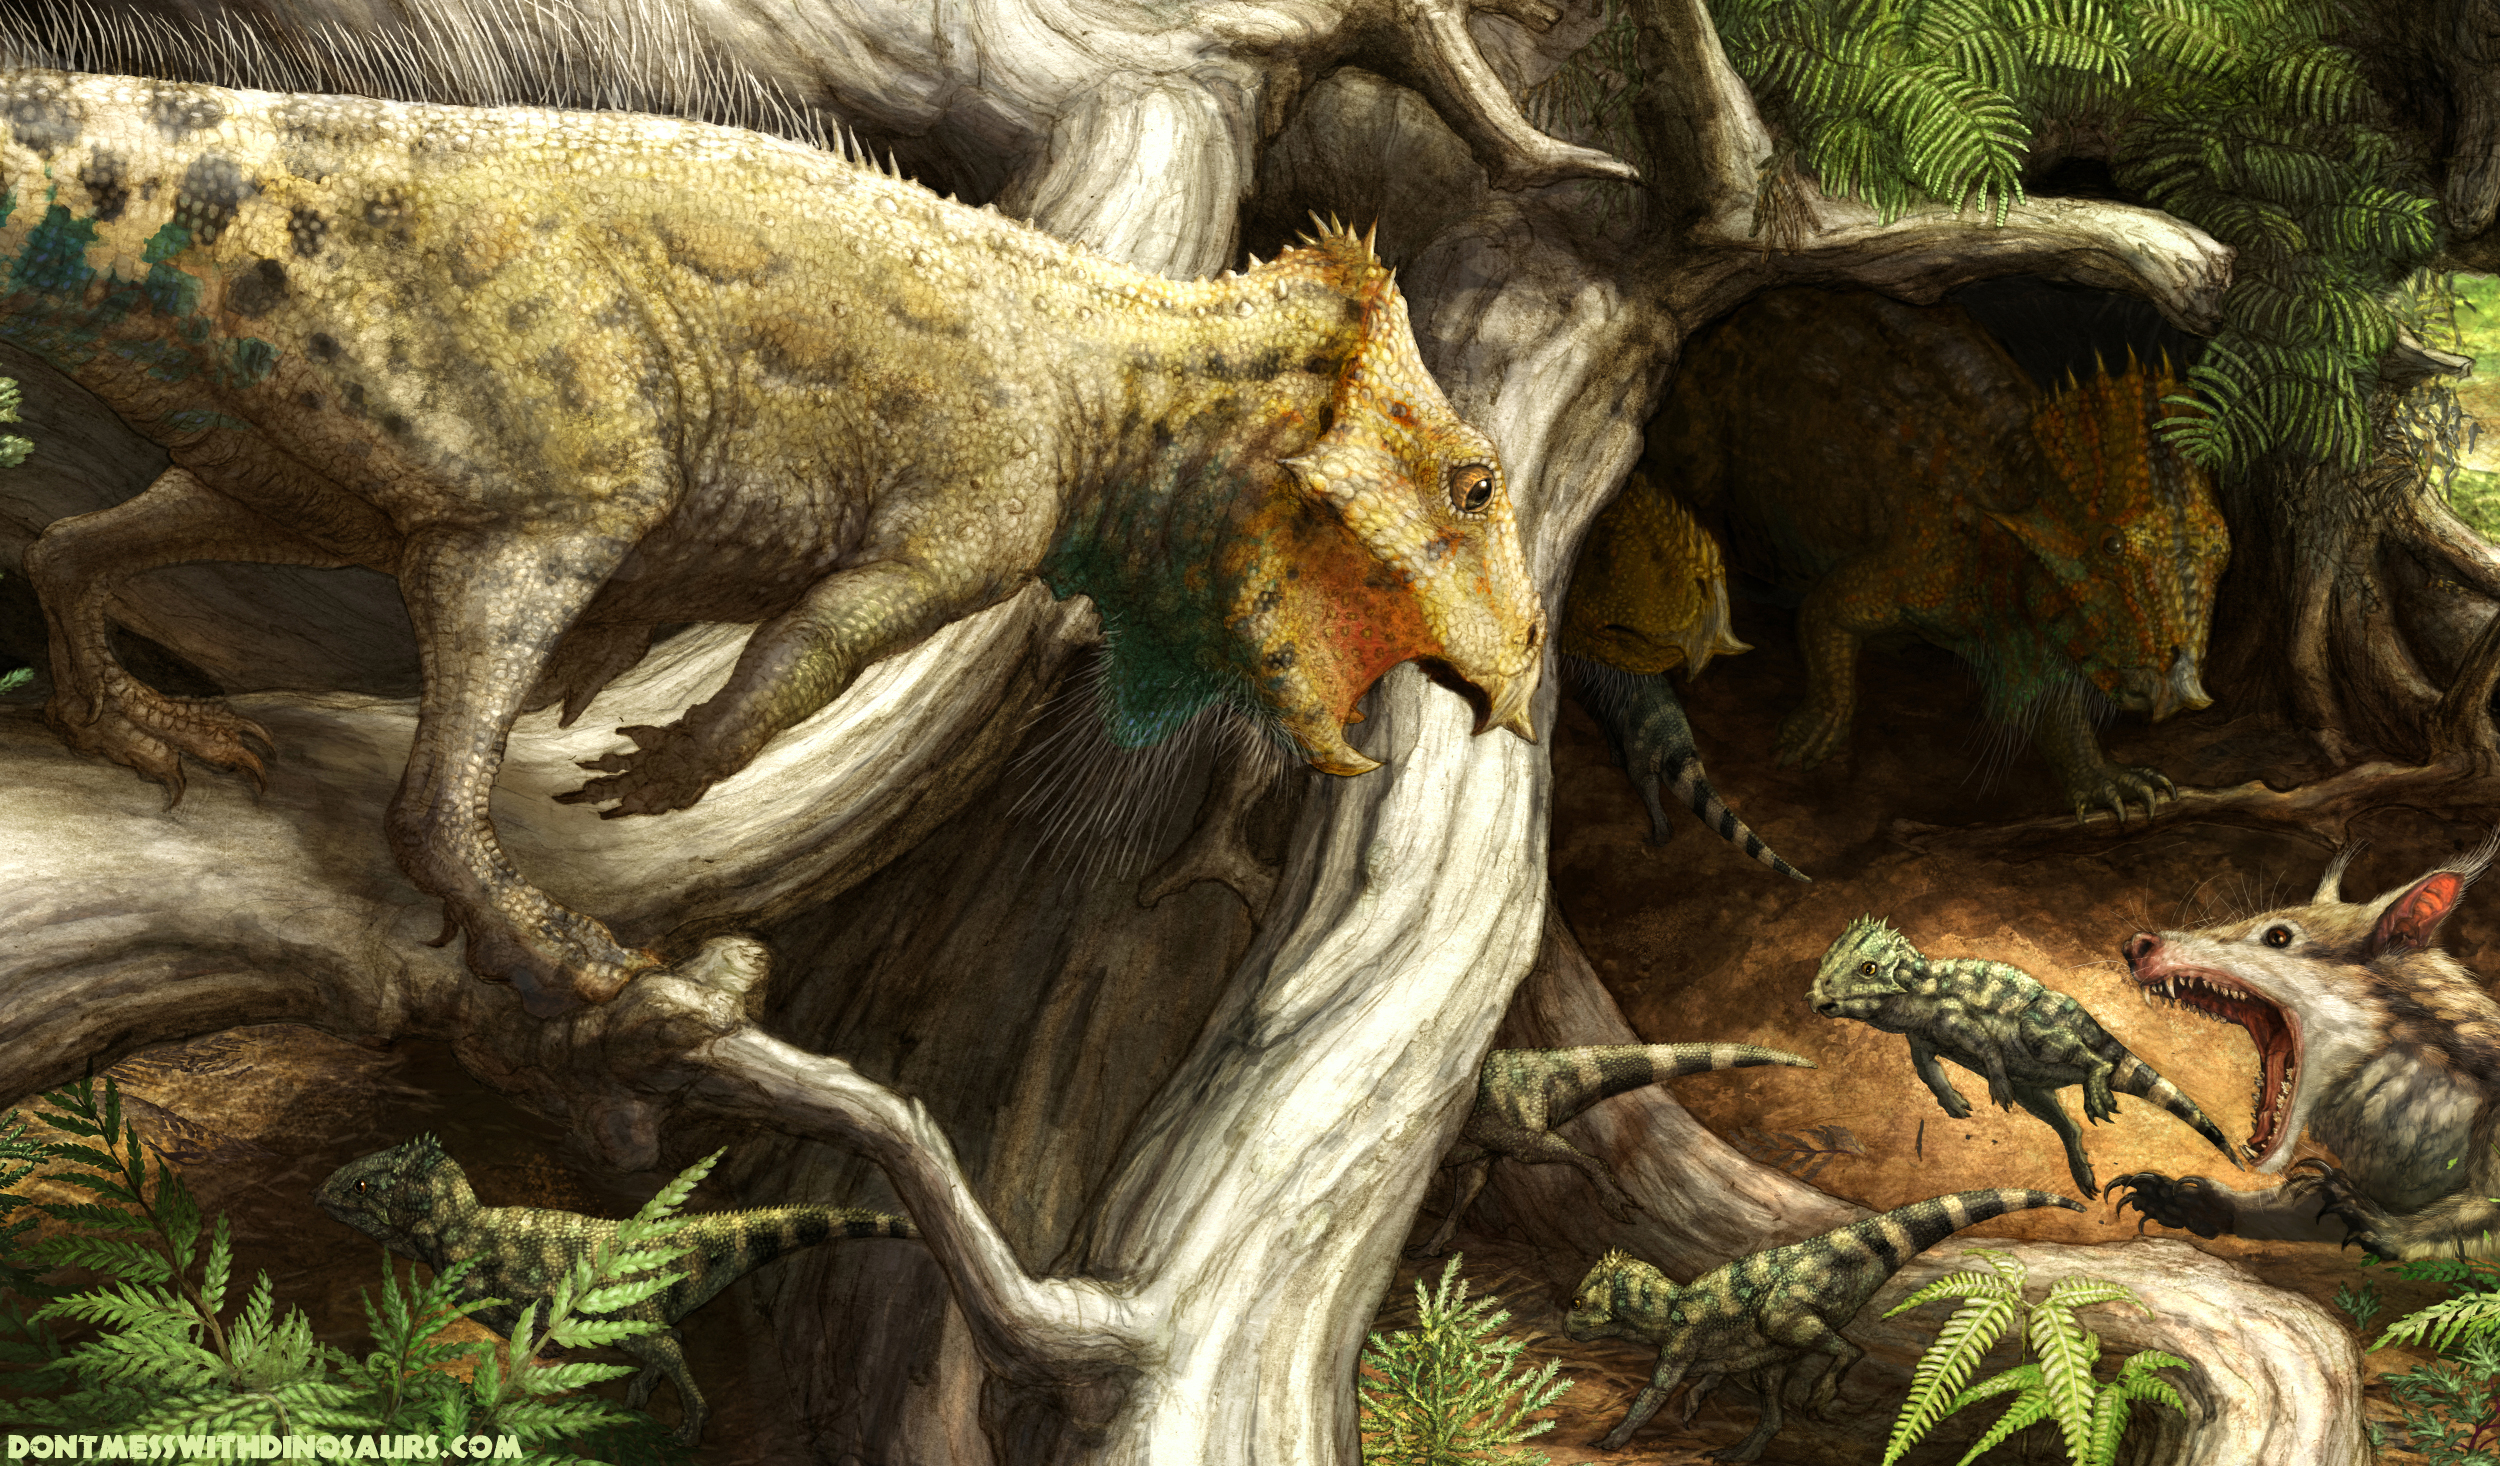 dontmesswithdinosaurscom 187 introducing aquilops americanus